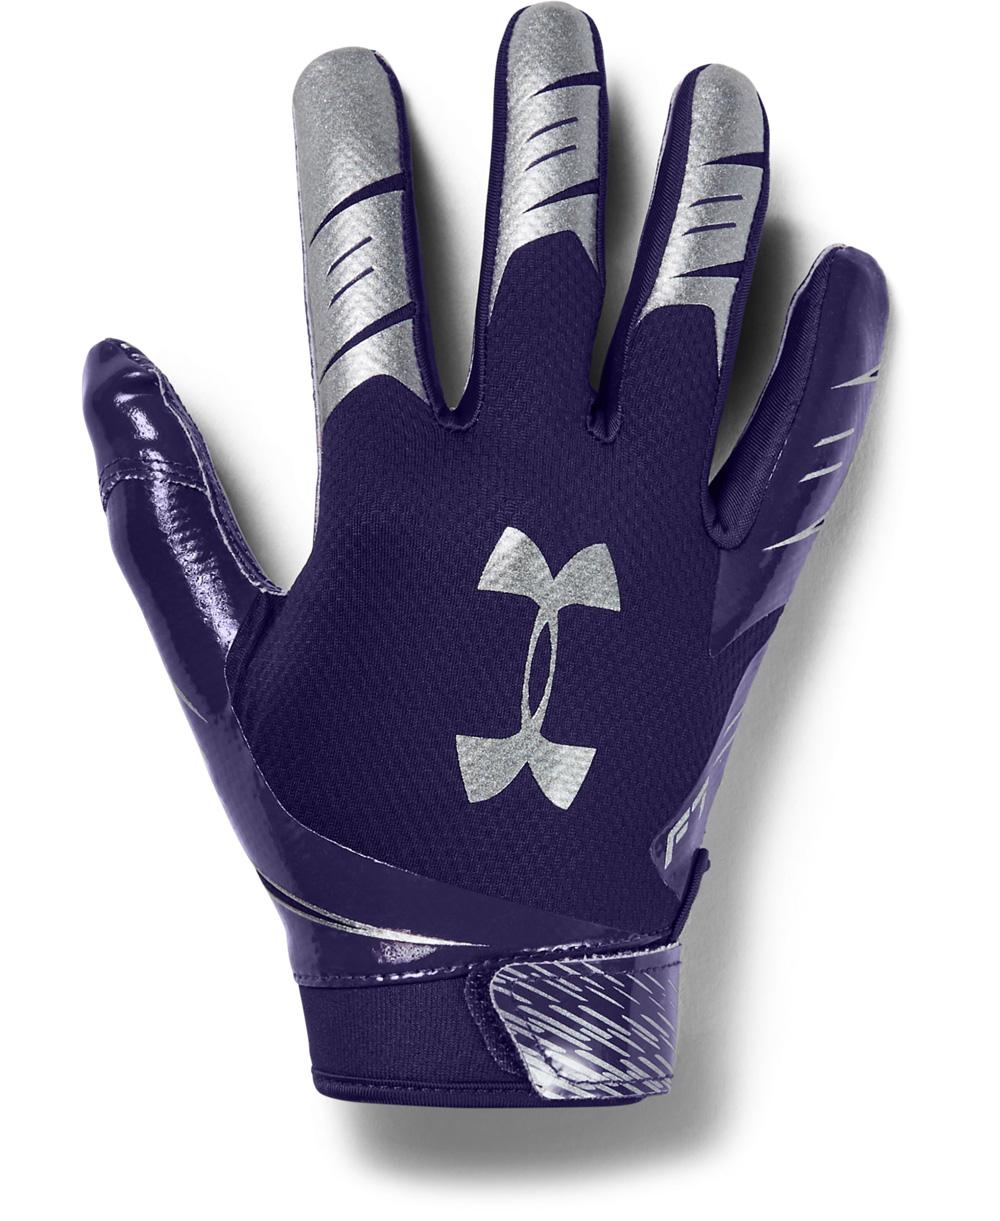 UA F7 Gants Football Américain Homme Purple